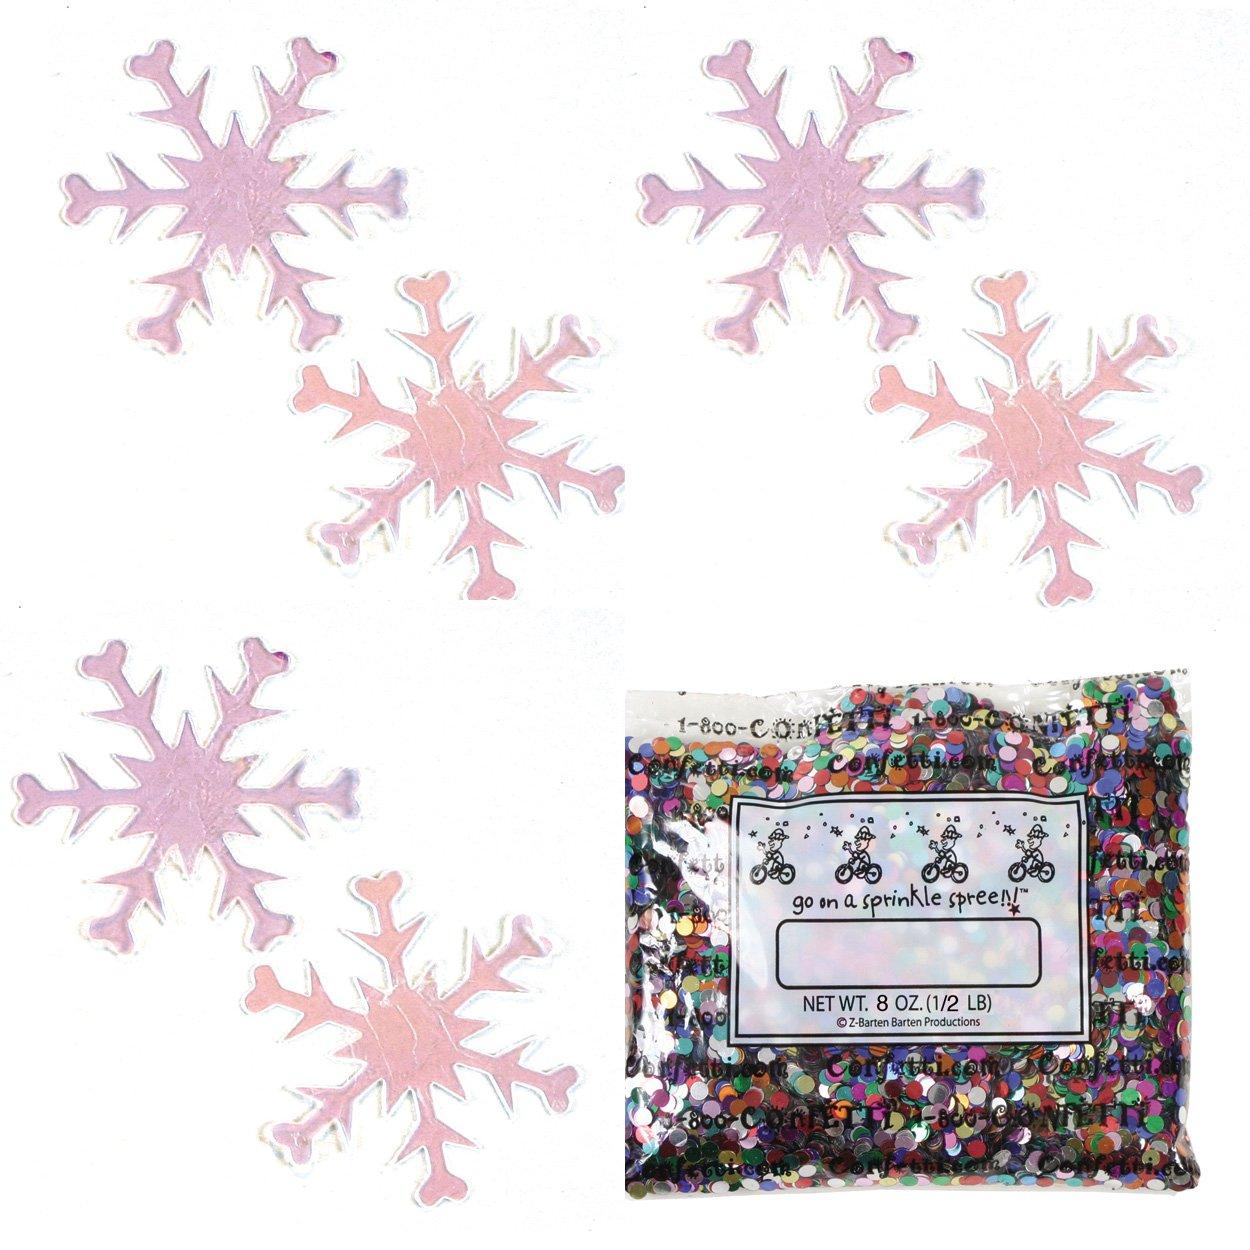 Confetti Snowflake Iridescent - Half Pound (8 oz) Free Ship (8589)